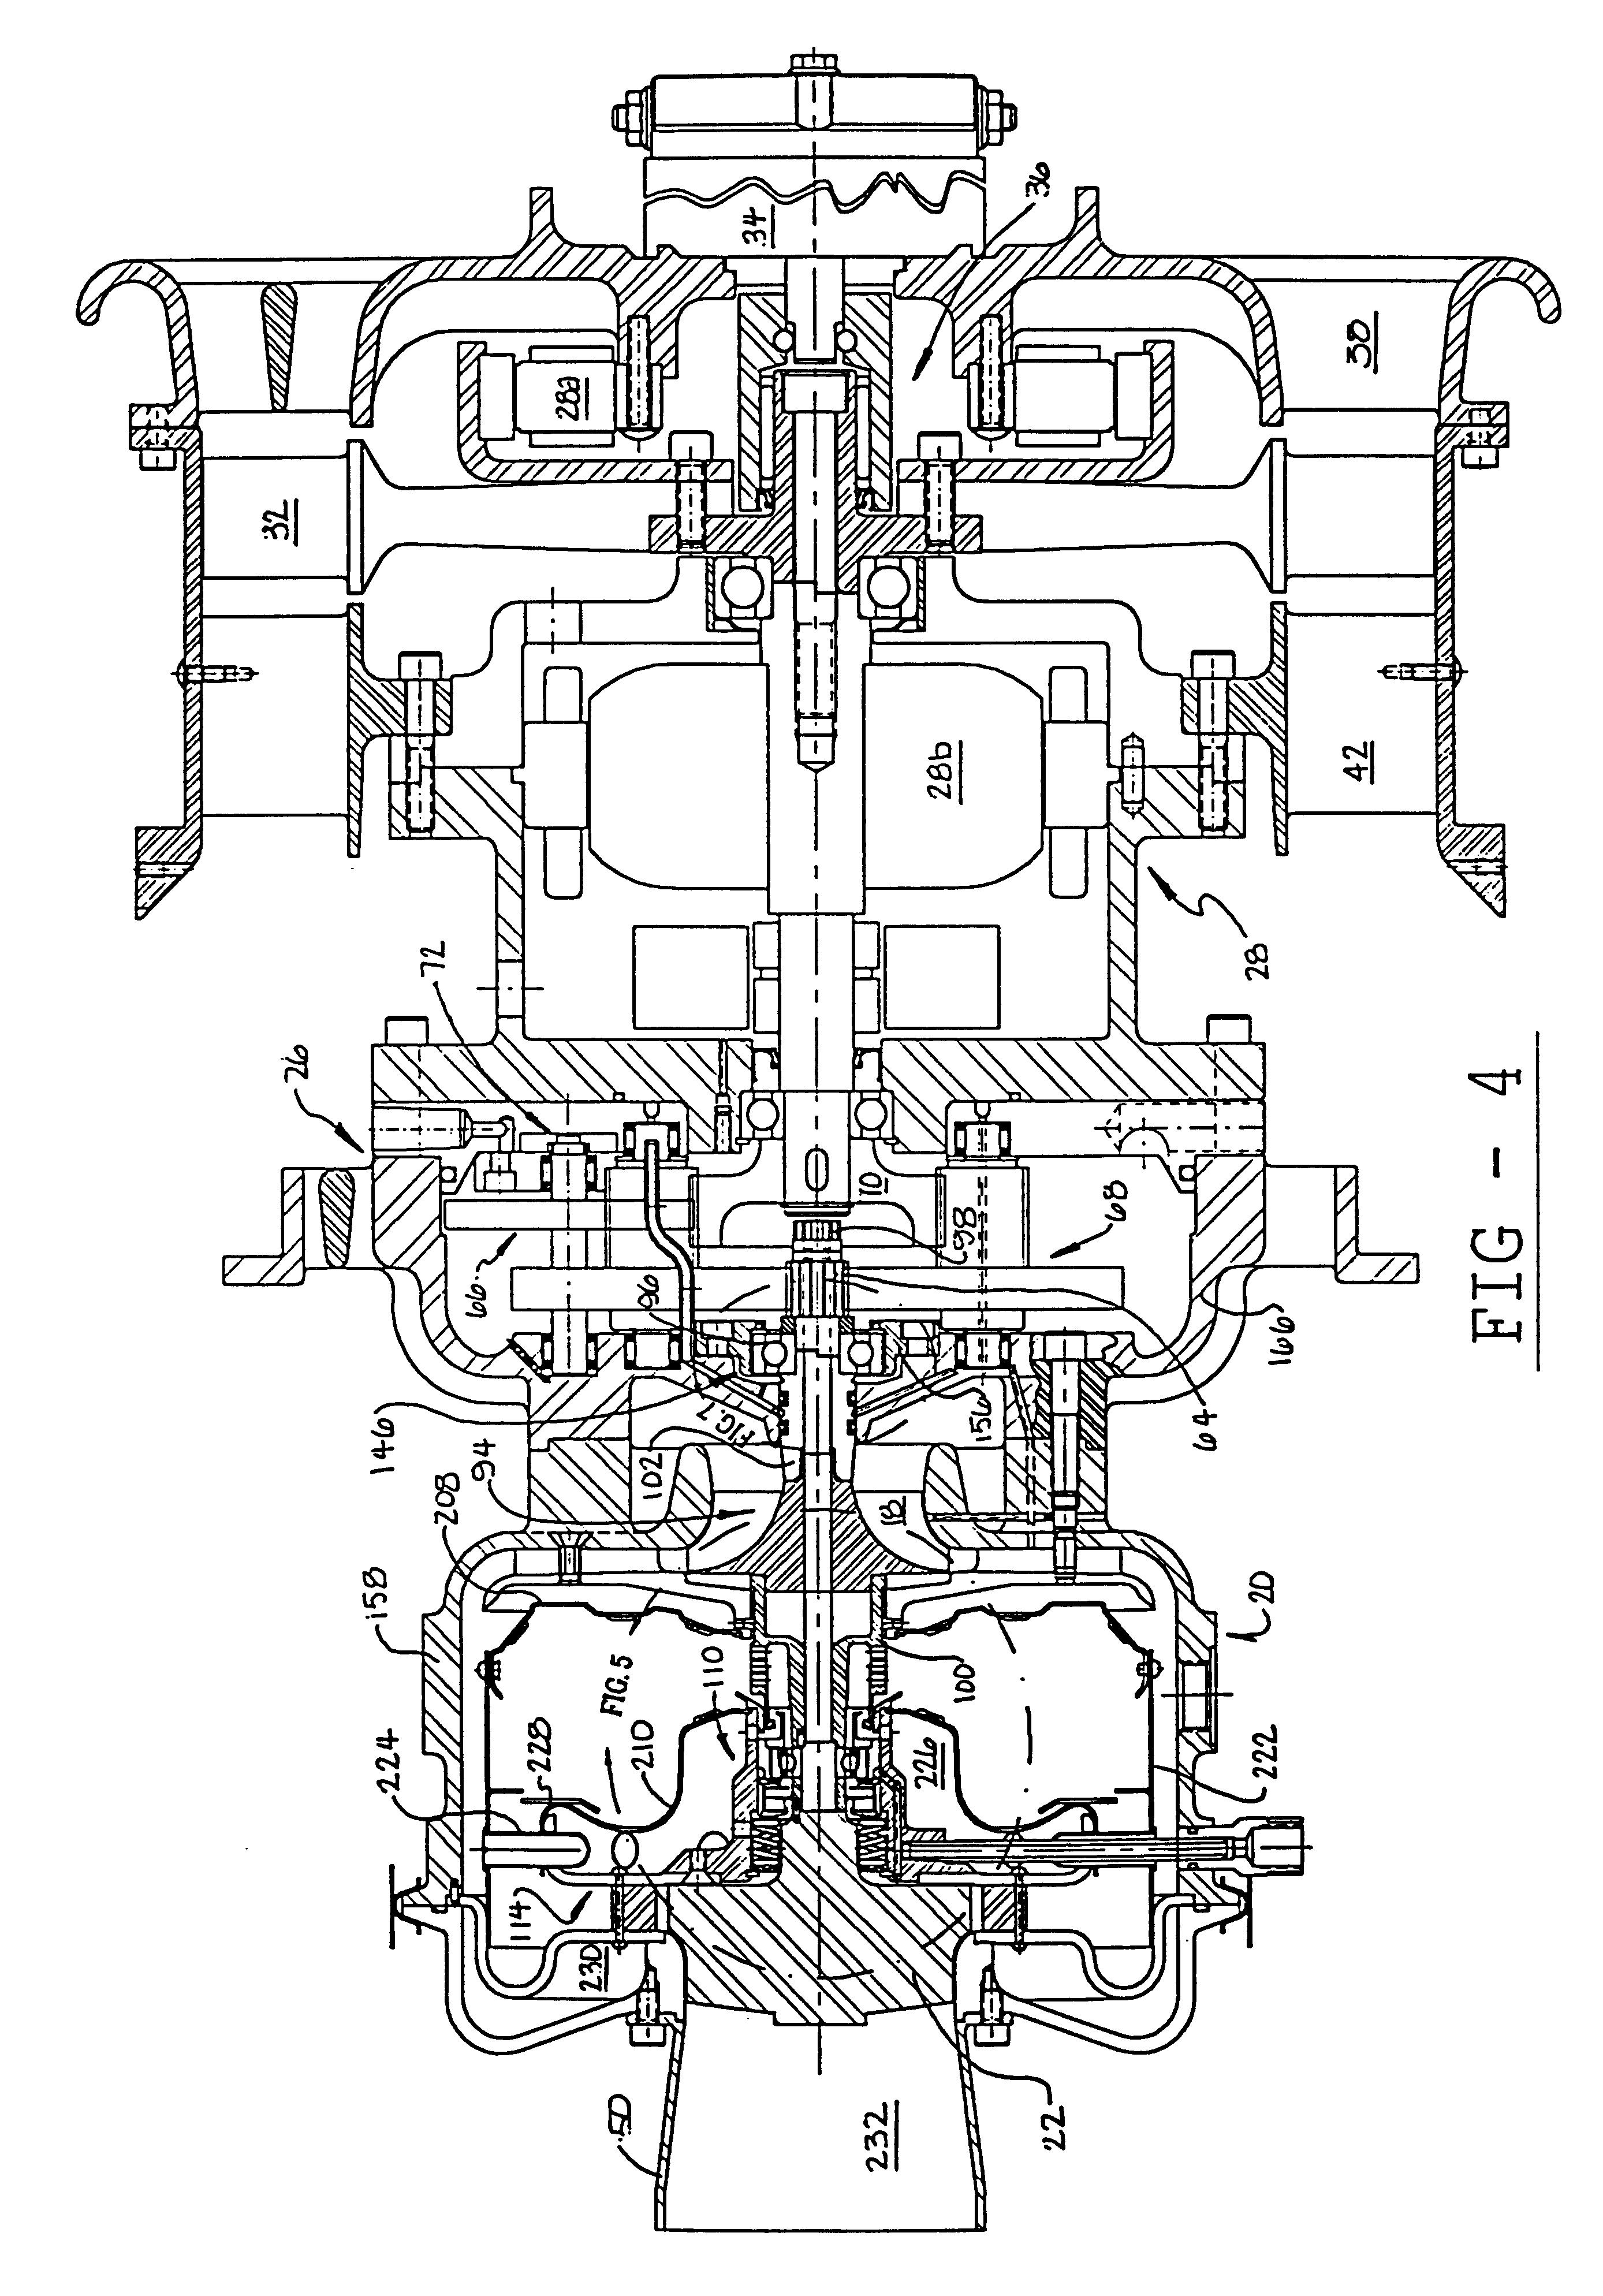 Patent US Co generator utilizing micro gas turbine engine